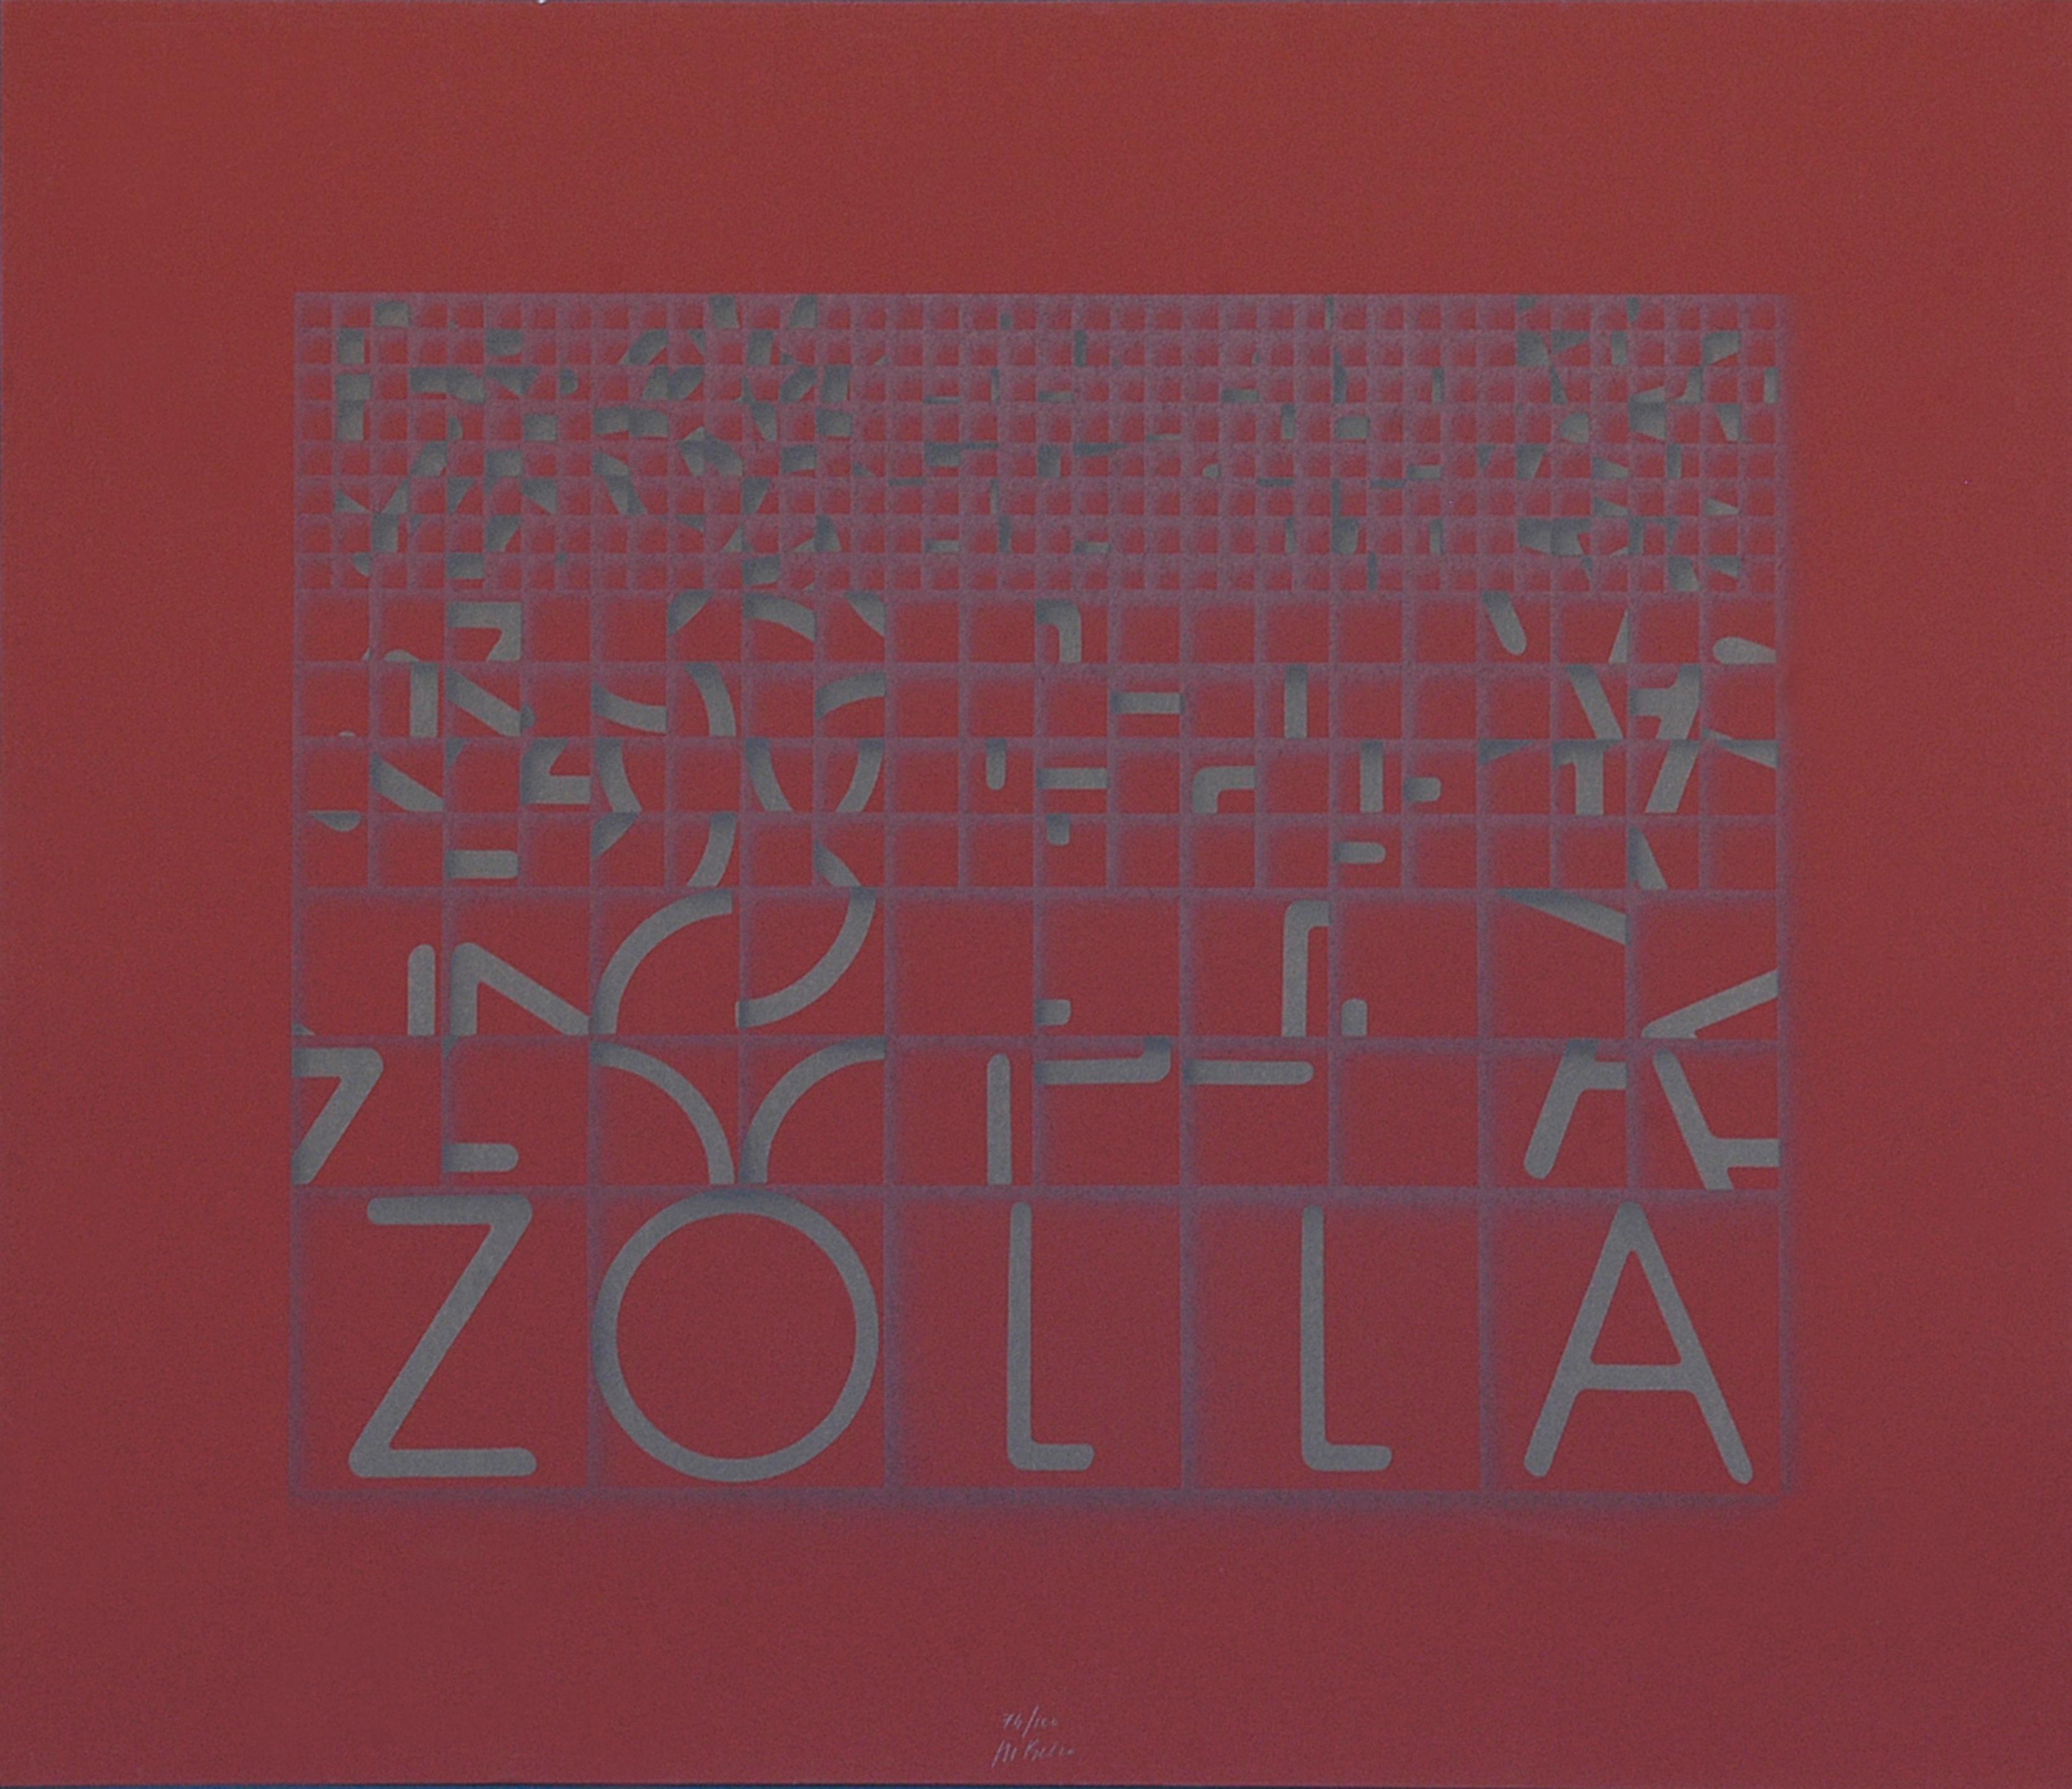 Zolla (Clod) - Original Screen Print by Bruno di Bello - 1980 ca.